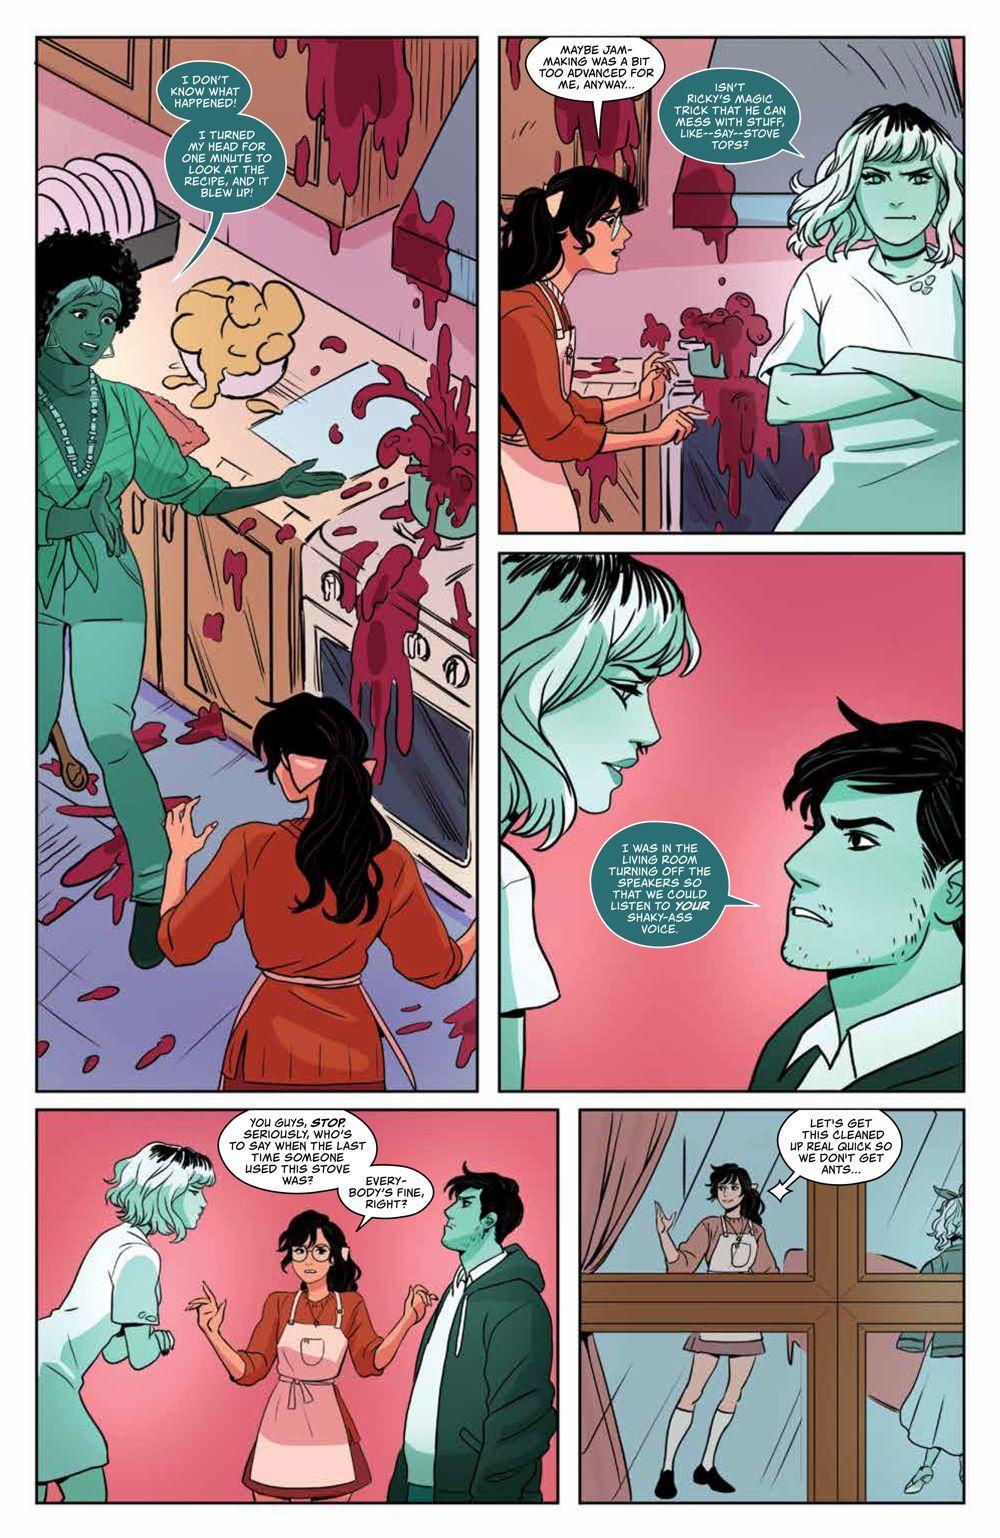 GhostedInLA_v3_SC_PRESS_16 ComicList Previews: GHOSTED IN L.A. VOLUME 3 TP